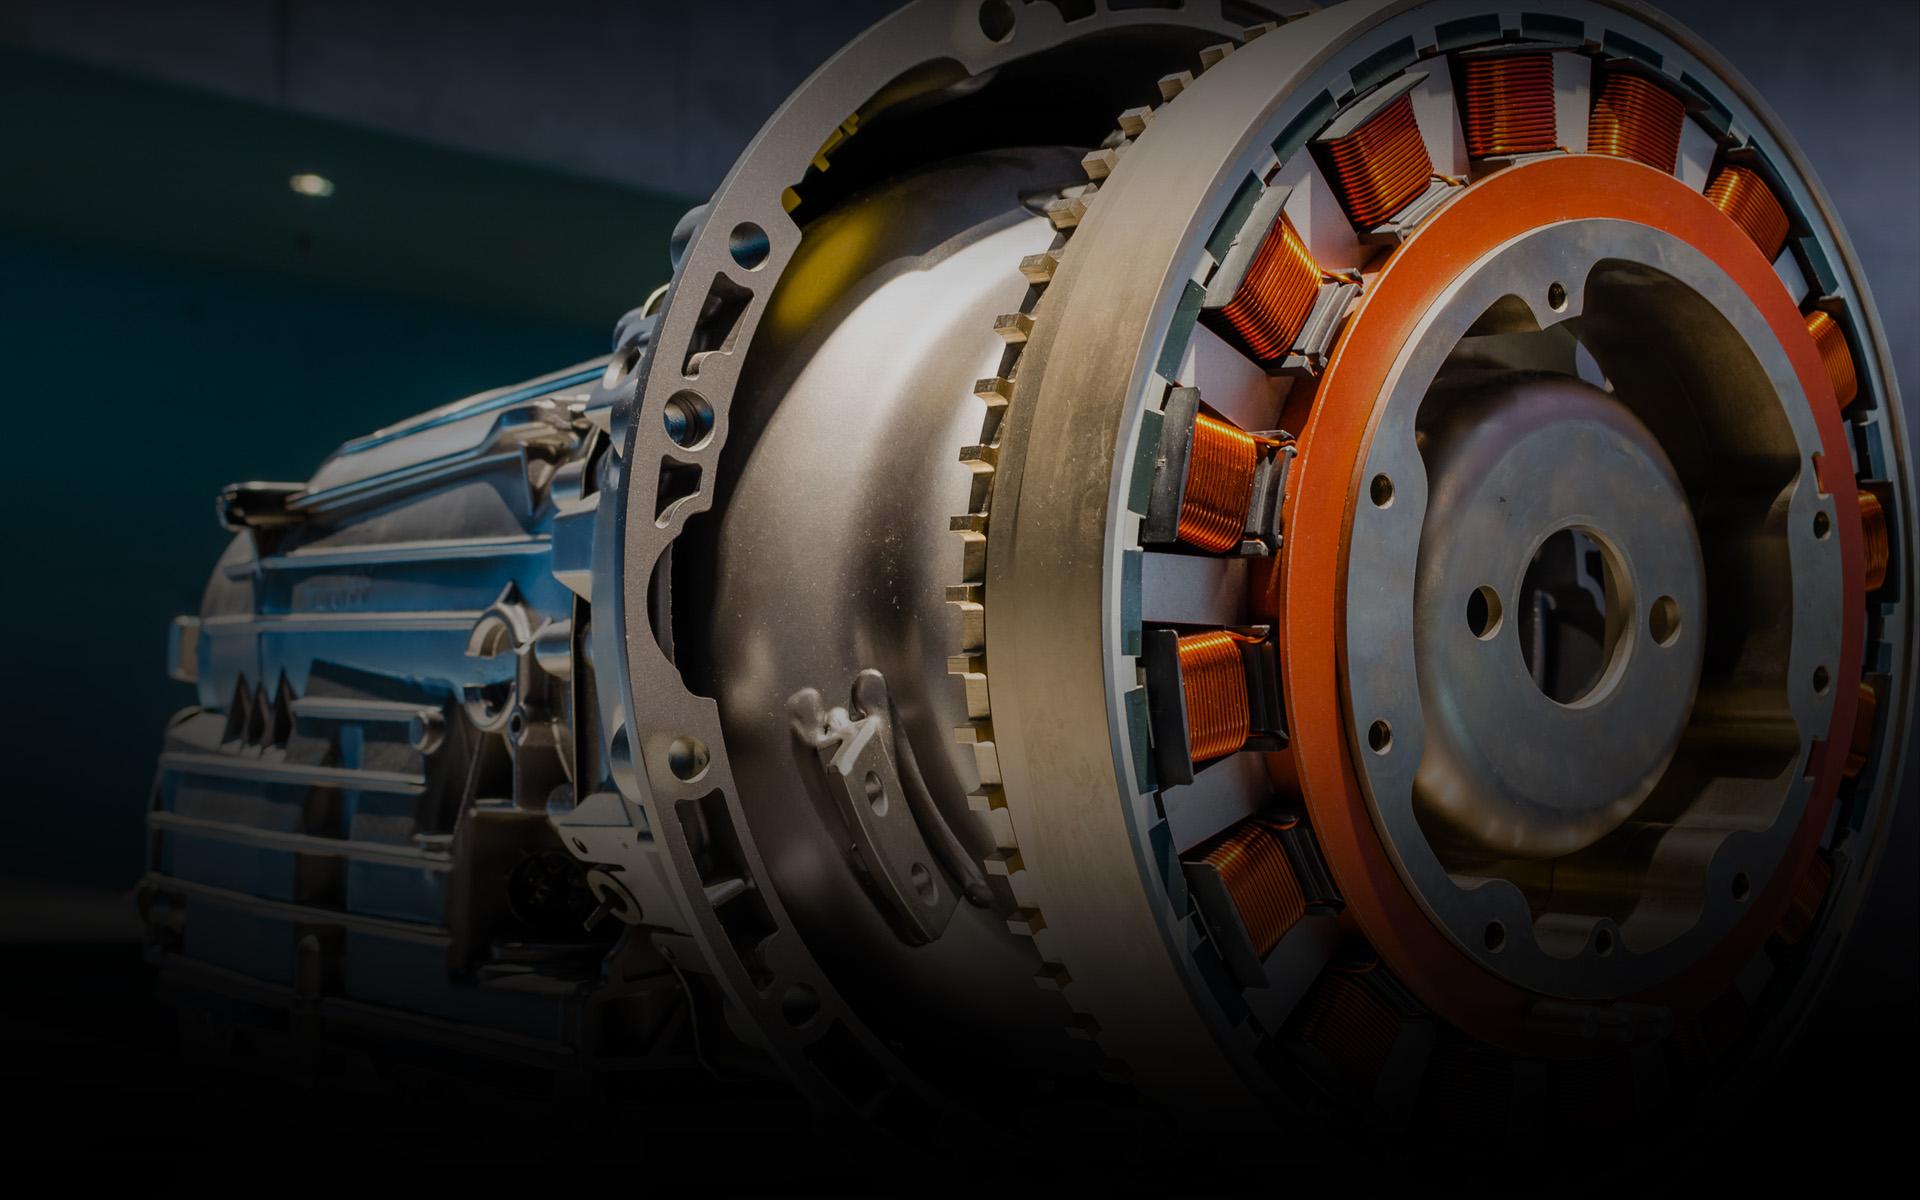 Mercedes-Benz<br>Automatikgetriebe